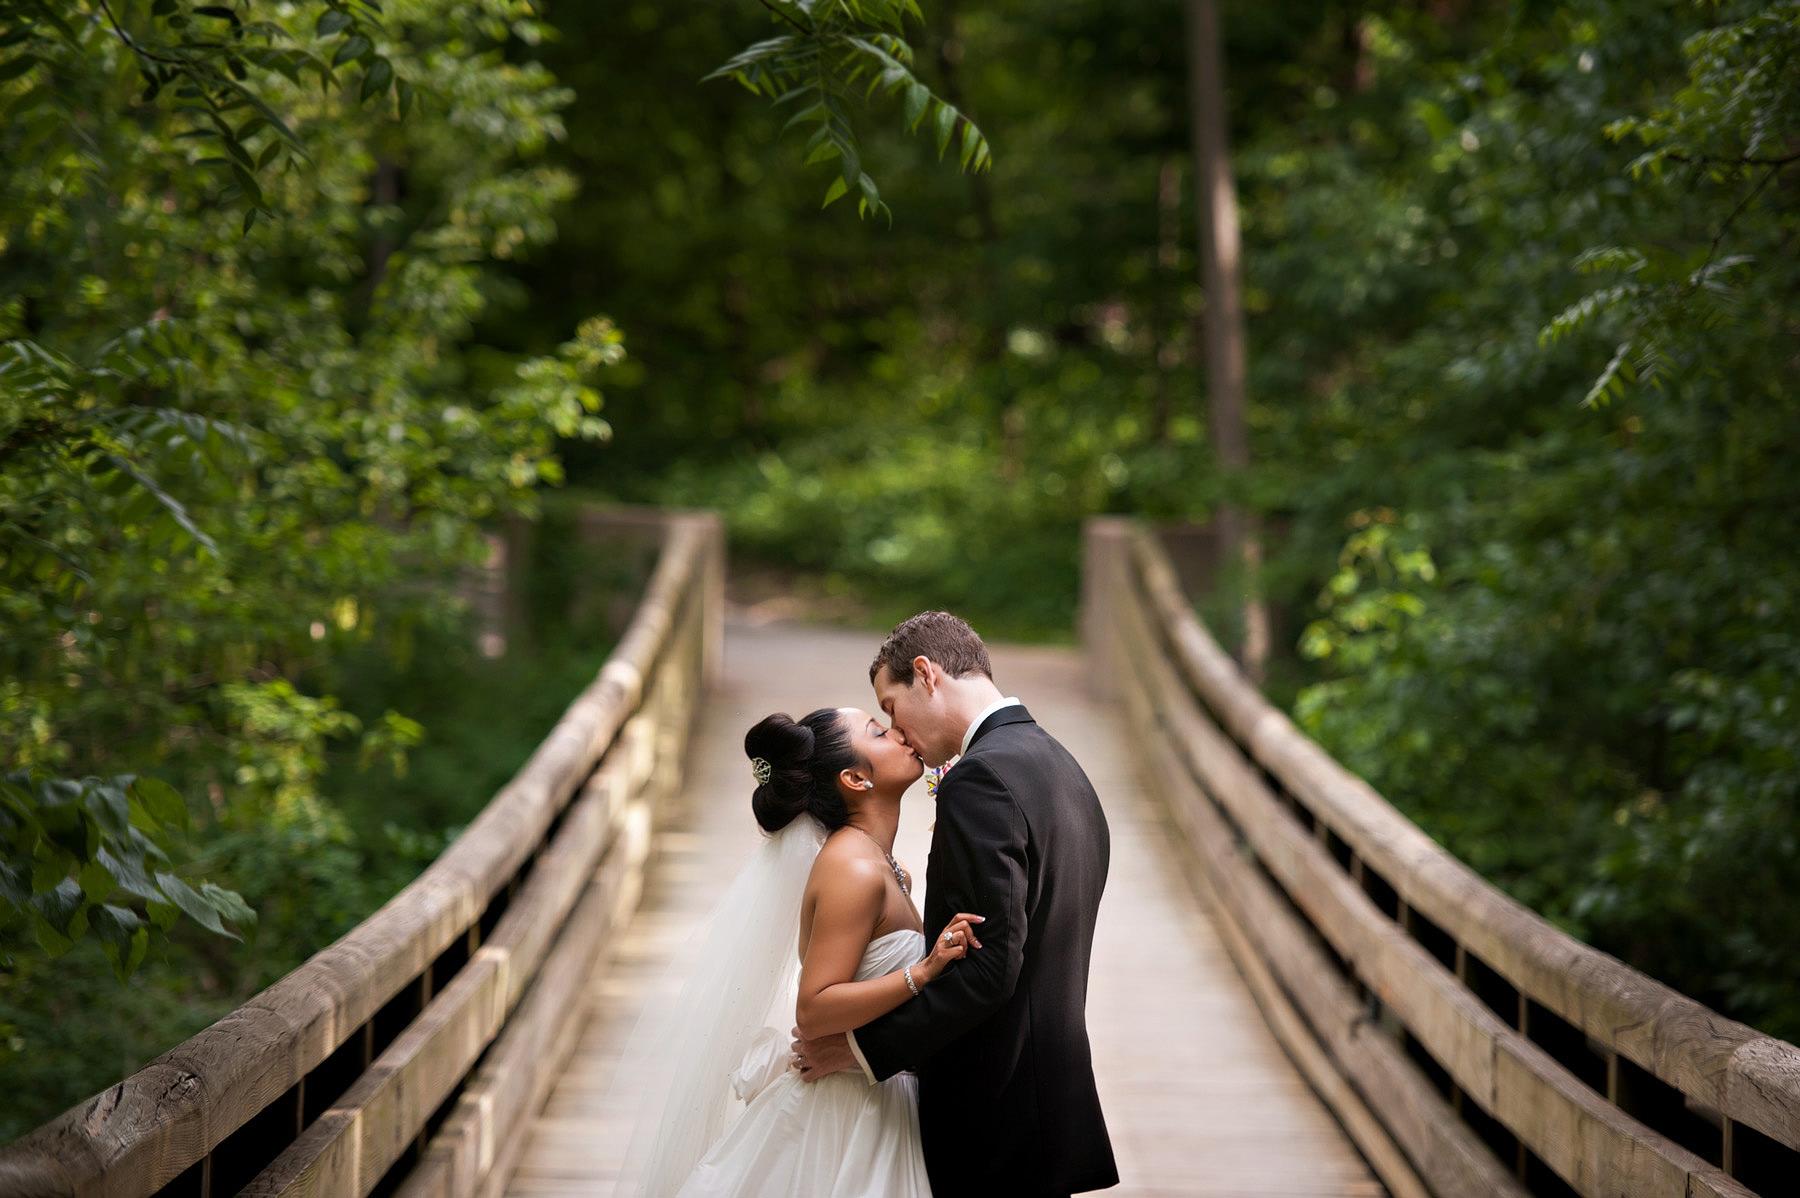 minnesota-wedding-photographers-mark-kegans-932.jpg